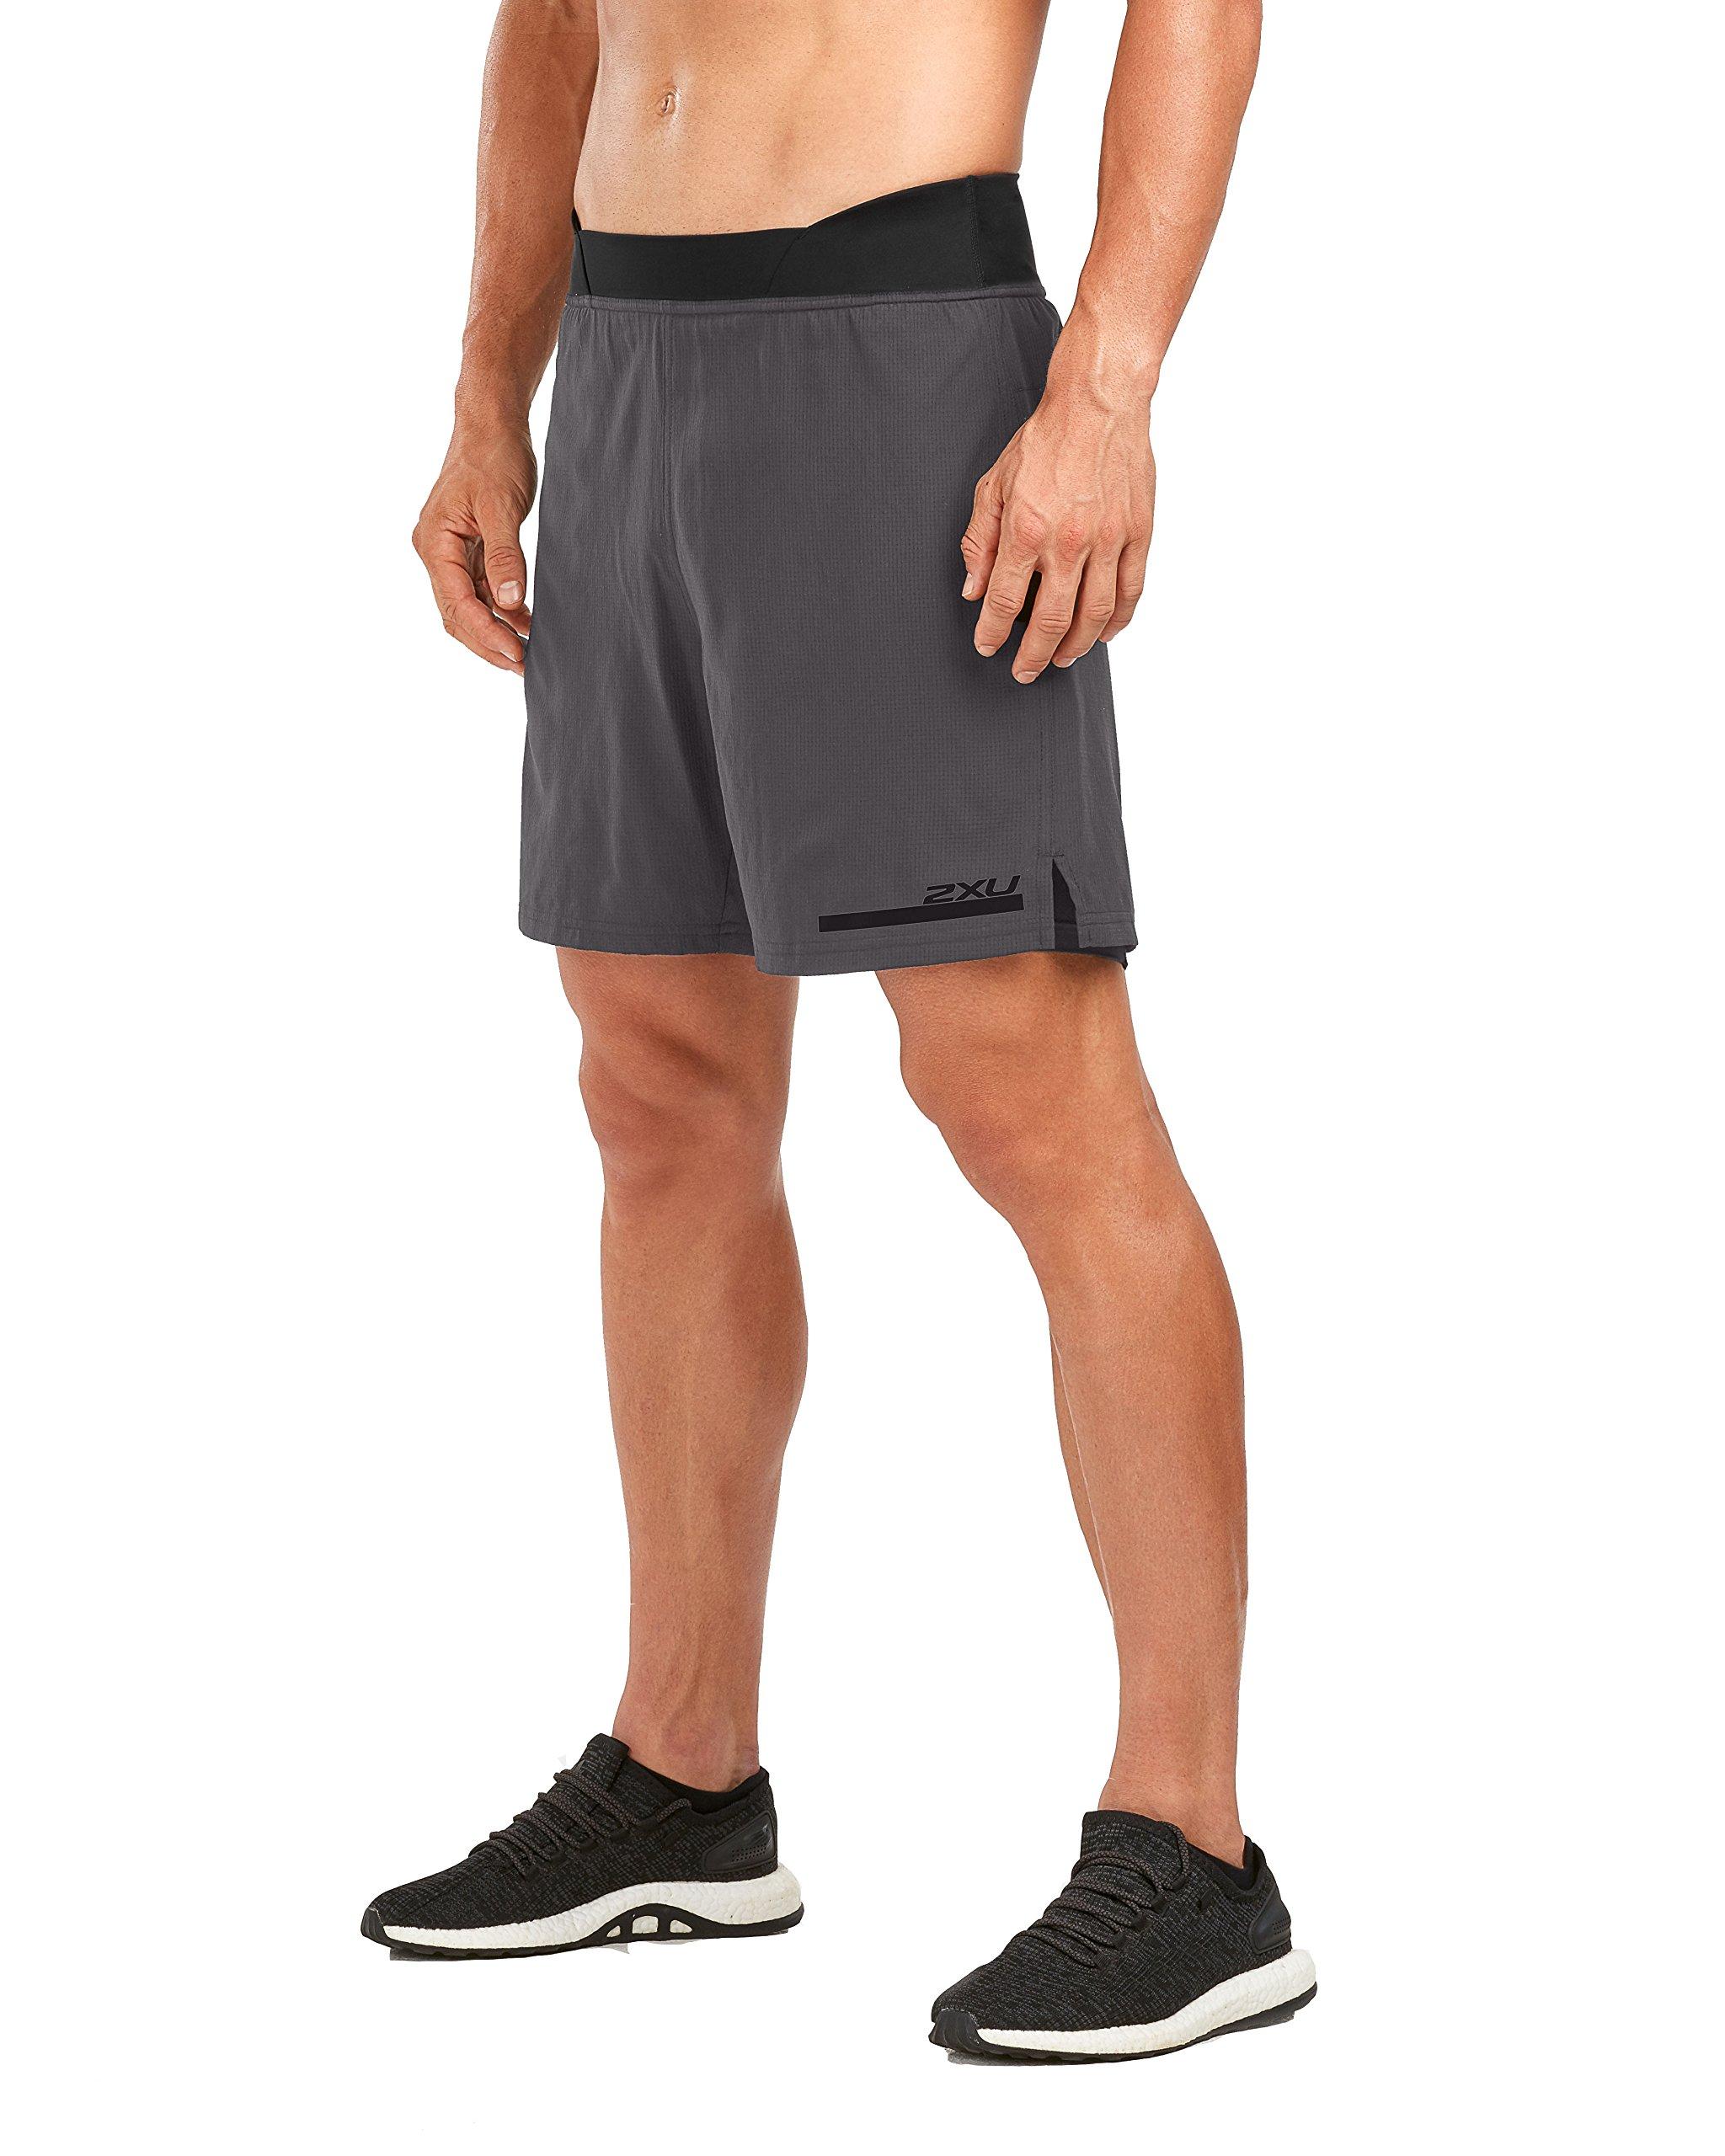 2XU Men's Run 2 in 1 Compression 7 Inch Shorts (Charcoal/Nero, Extra Small)